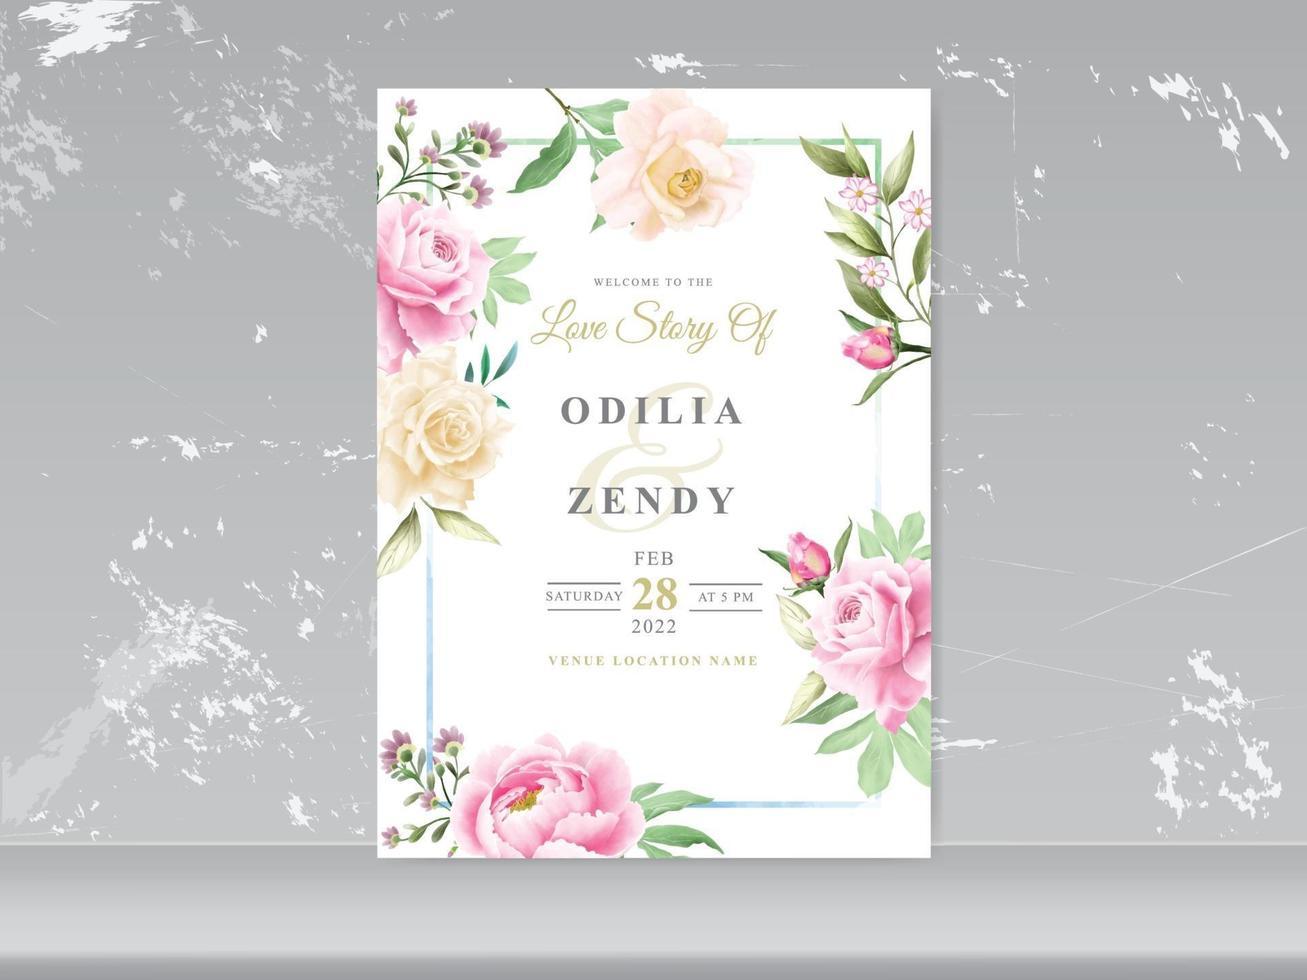 romantisk blommig akvarell bröllopskort vektor